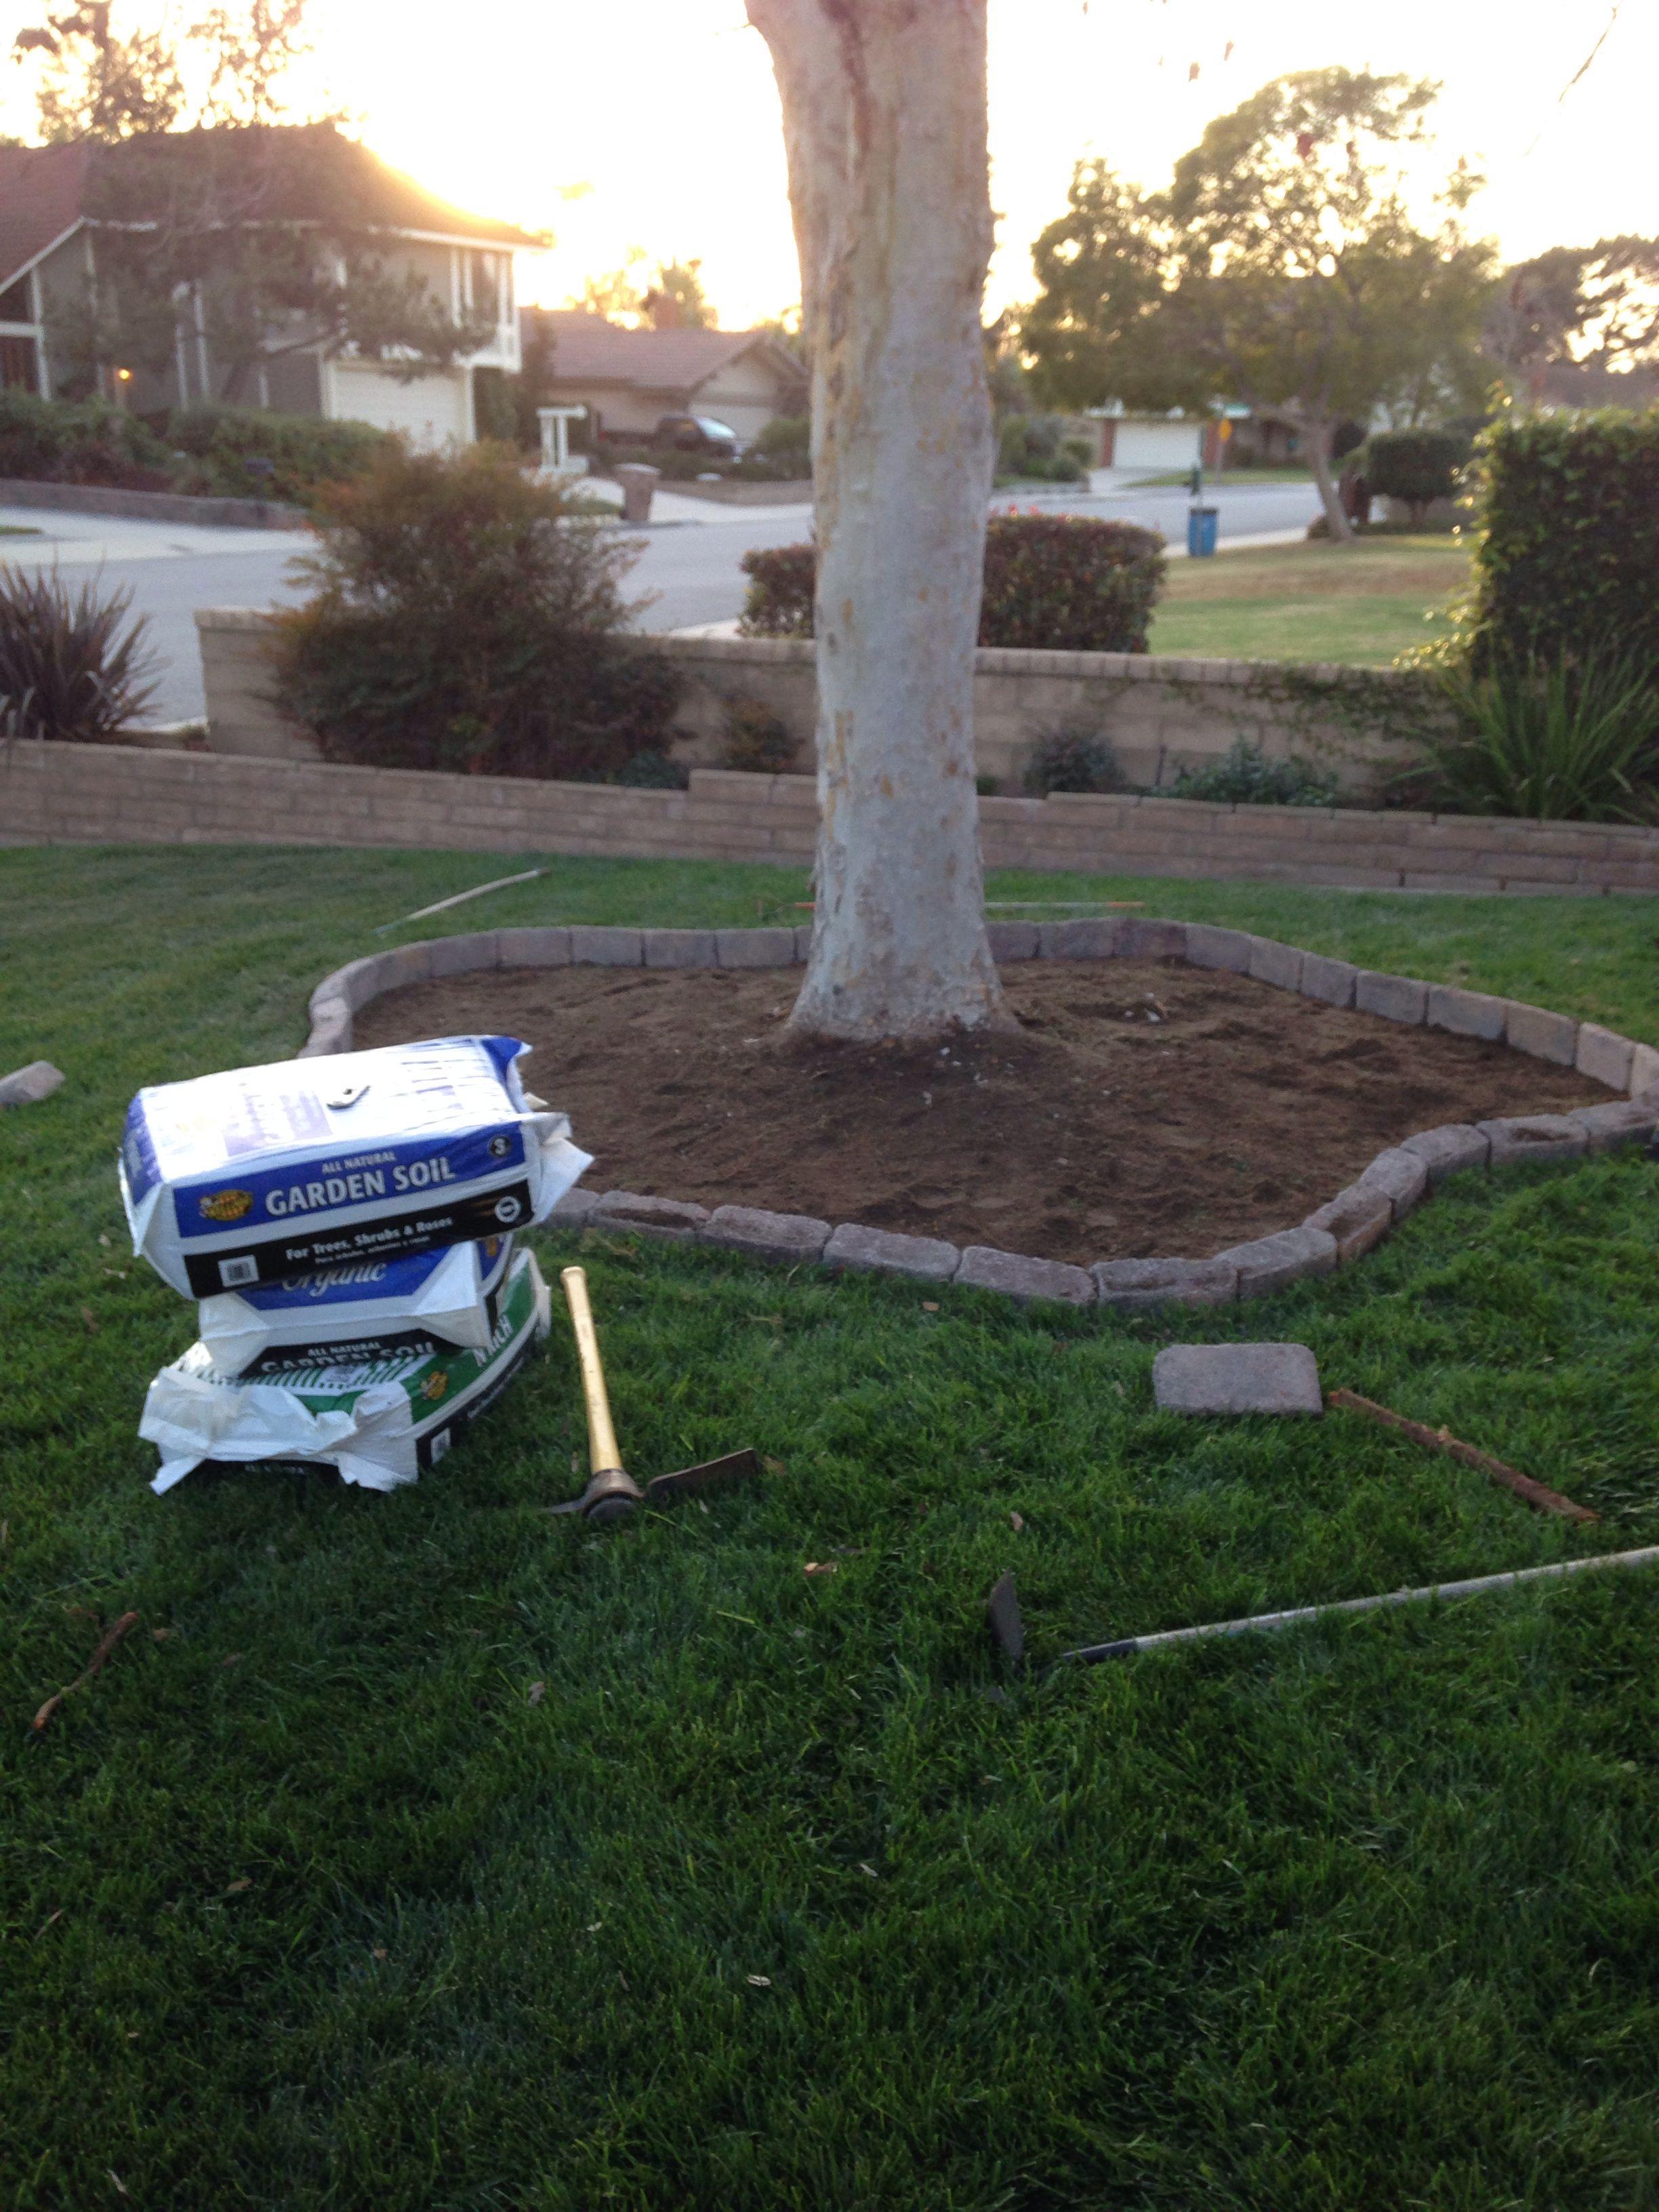 Add some new garden soil